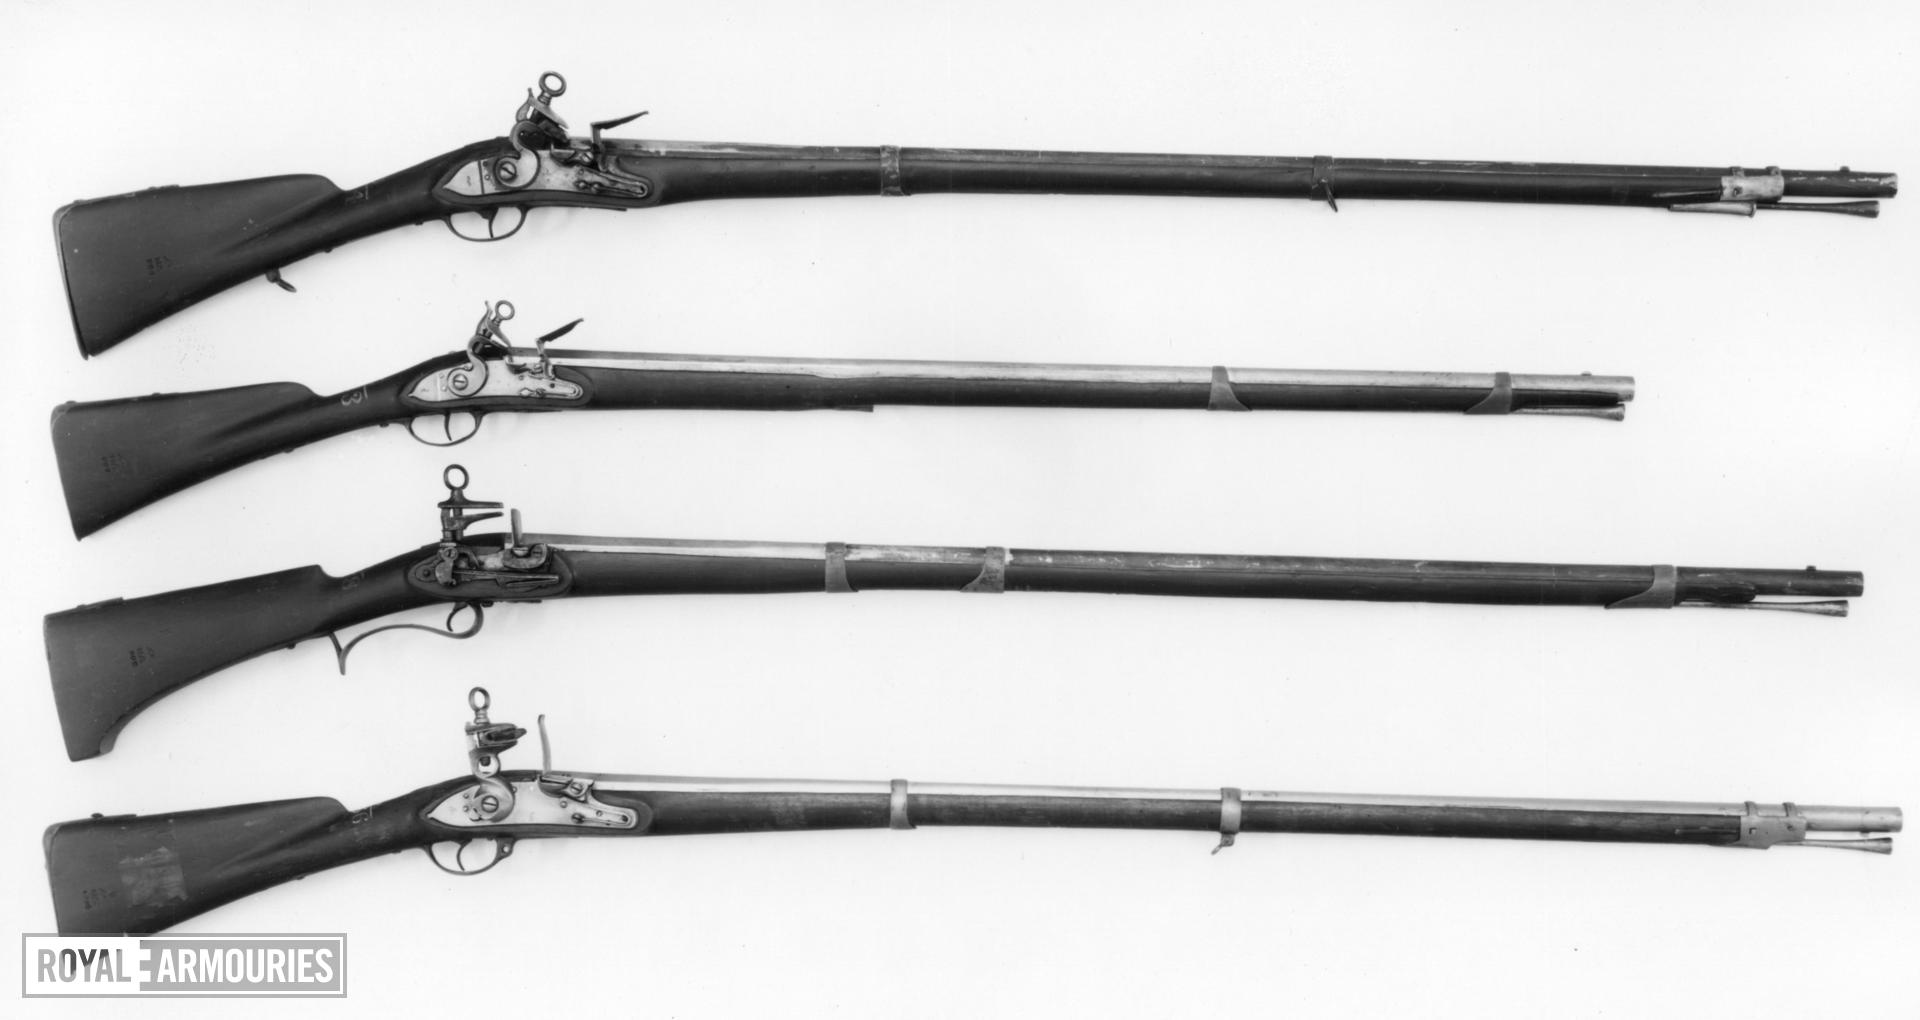 Flintlock muzzle-loading musket - Light Infantry and Constabulary Model